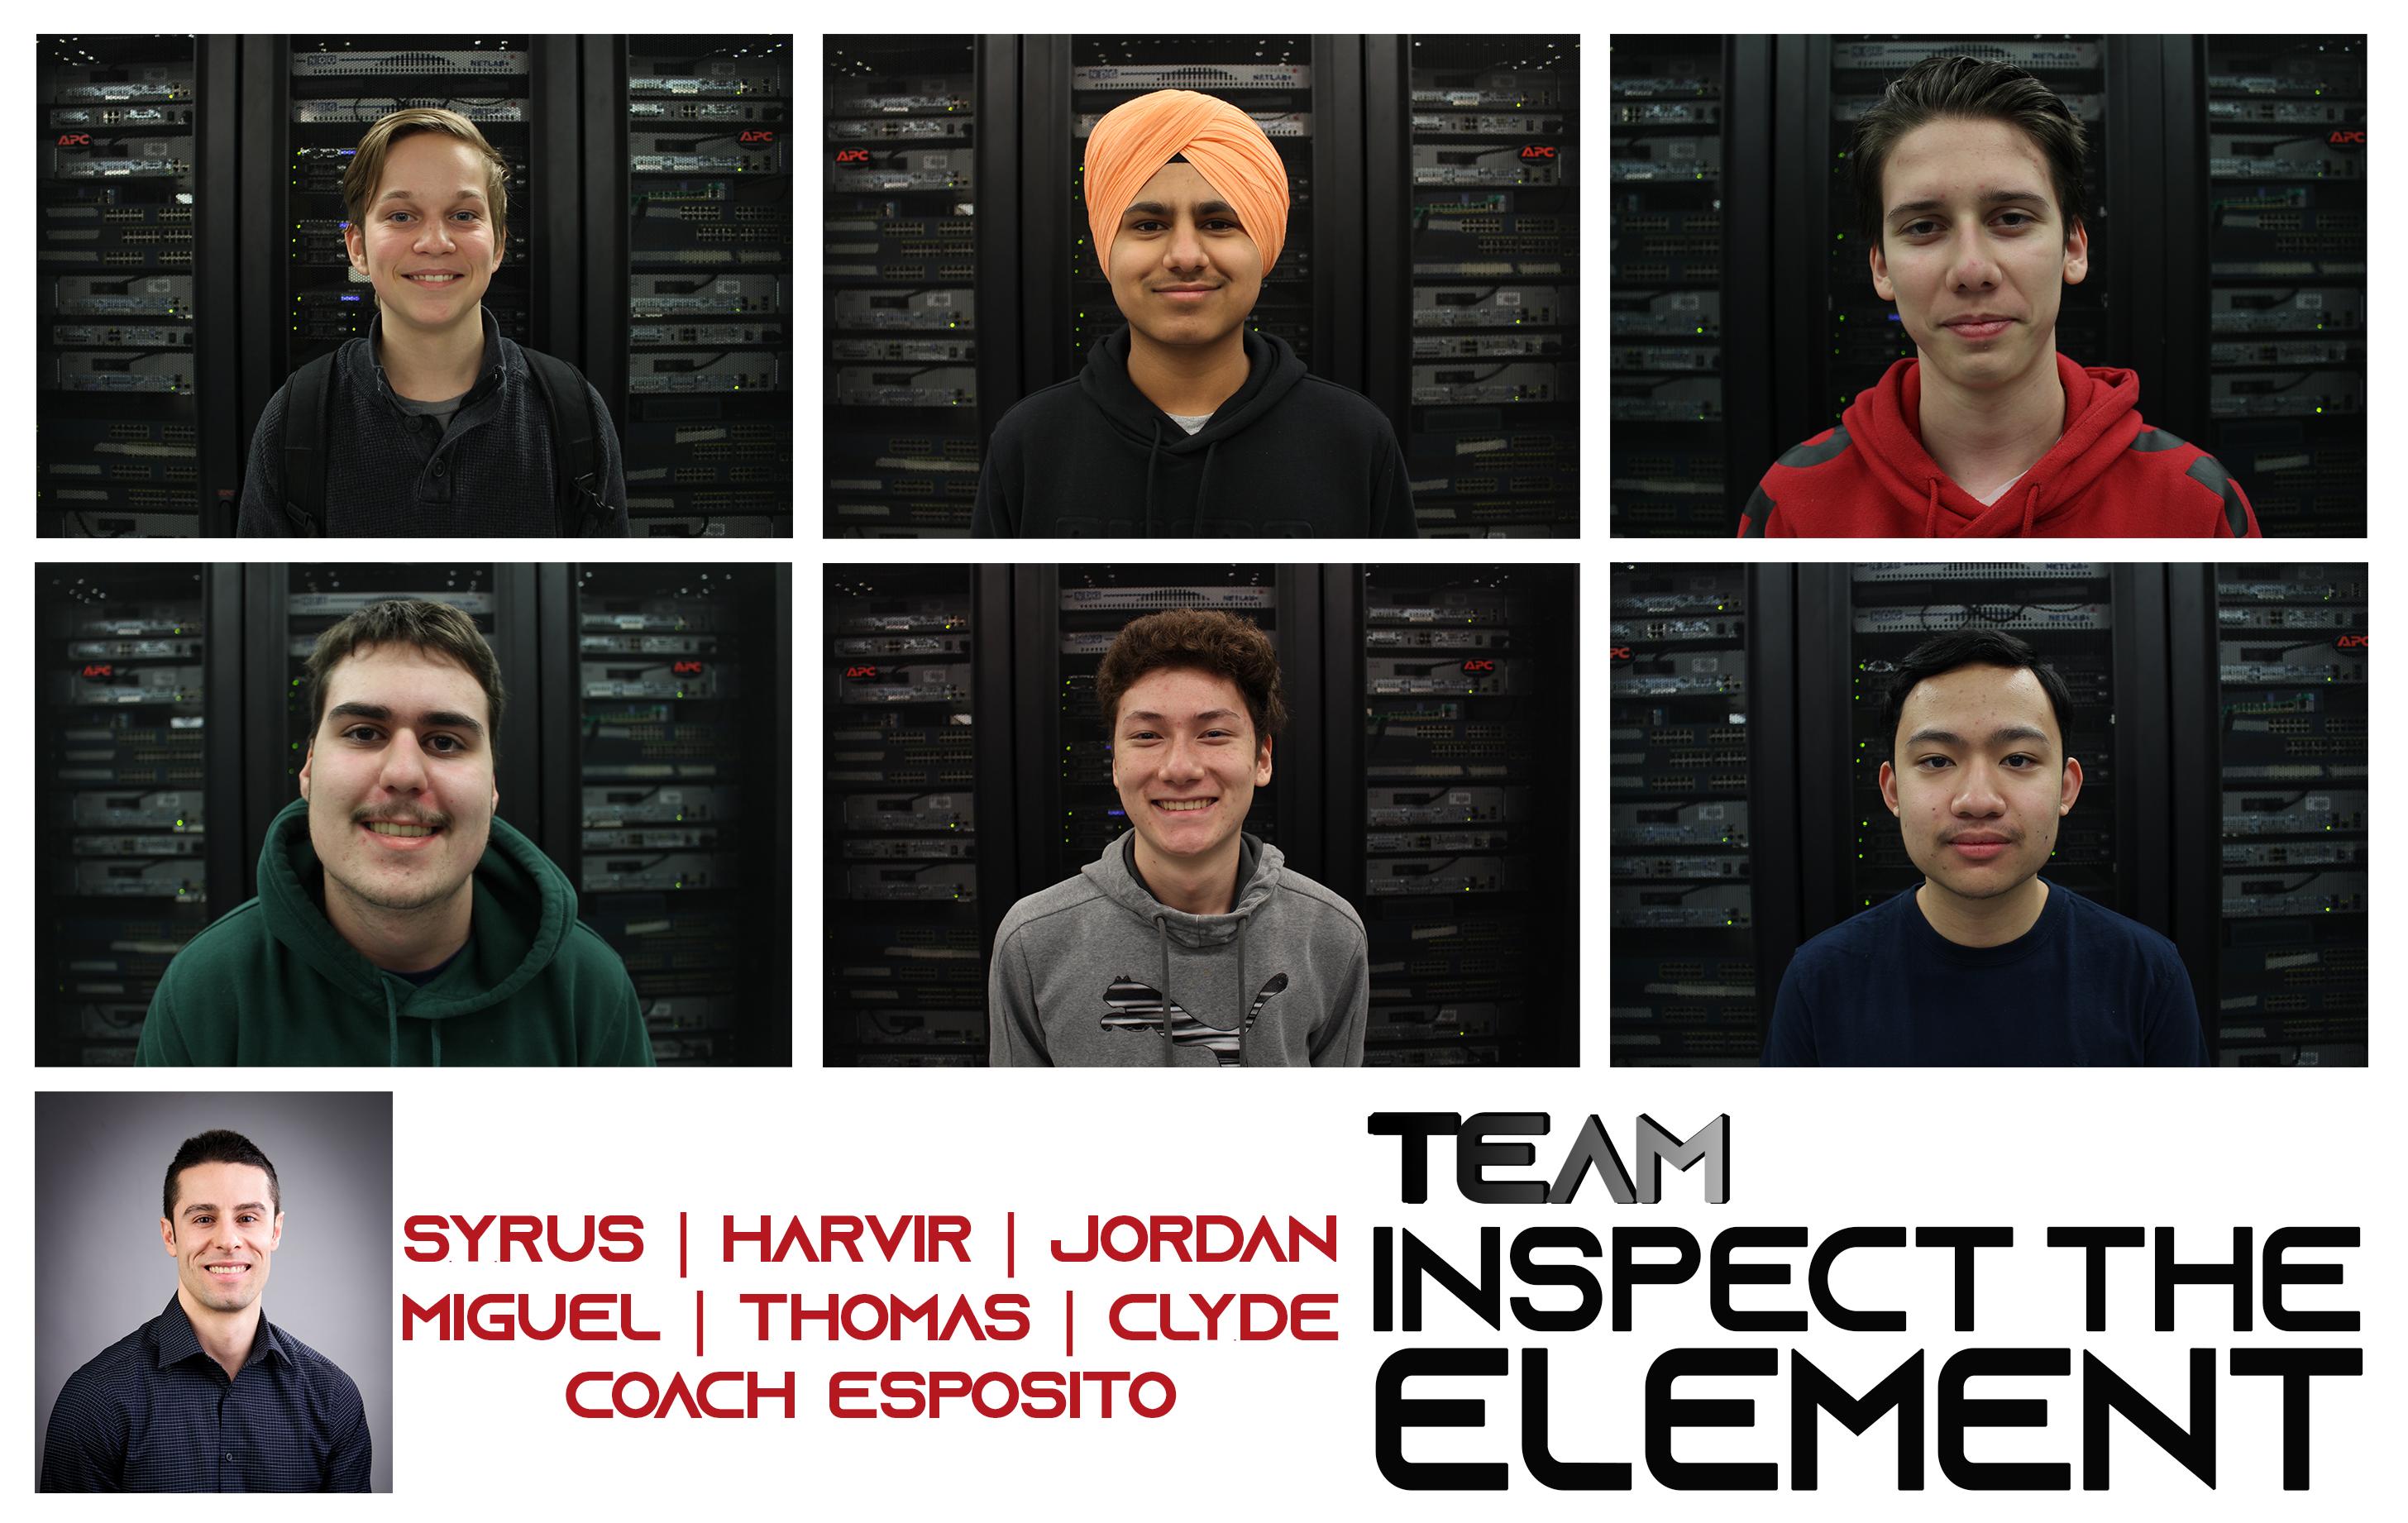 Meet the CyberTitans: Team Inspect The Element